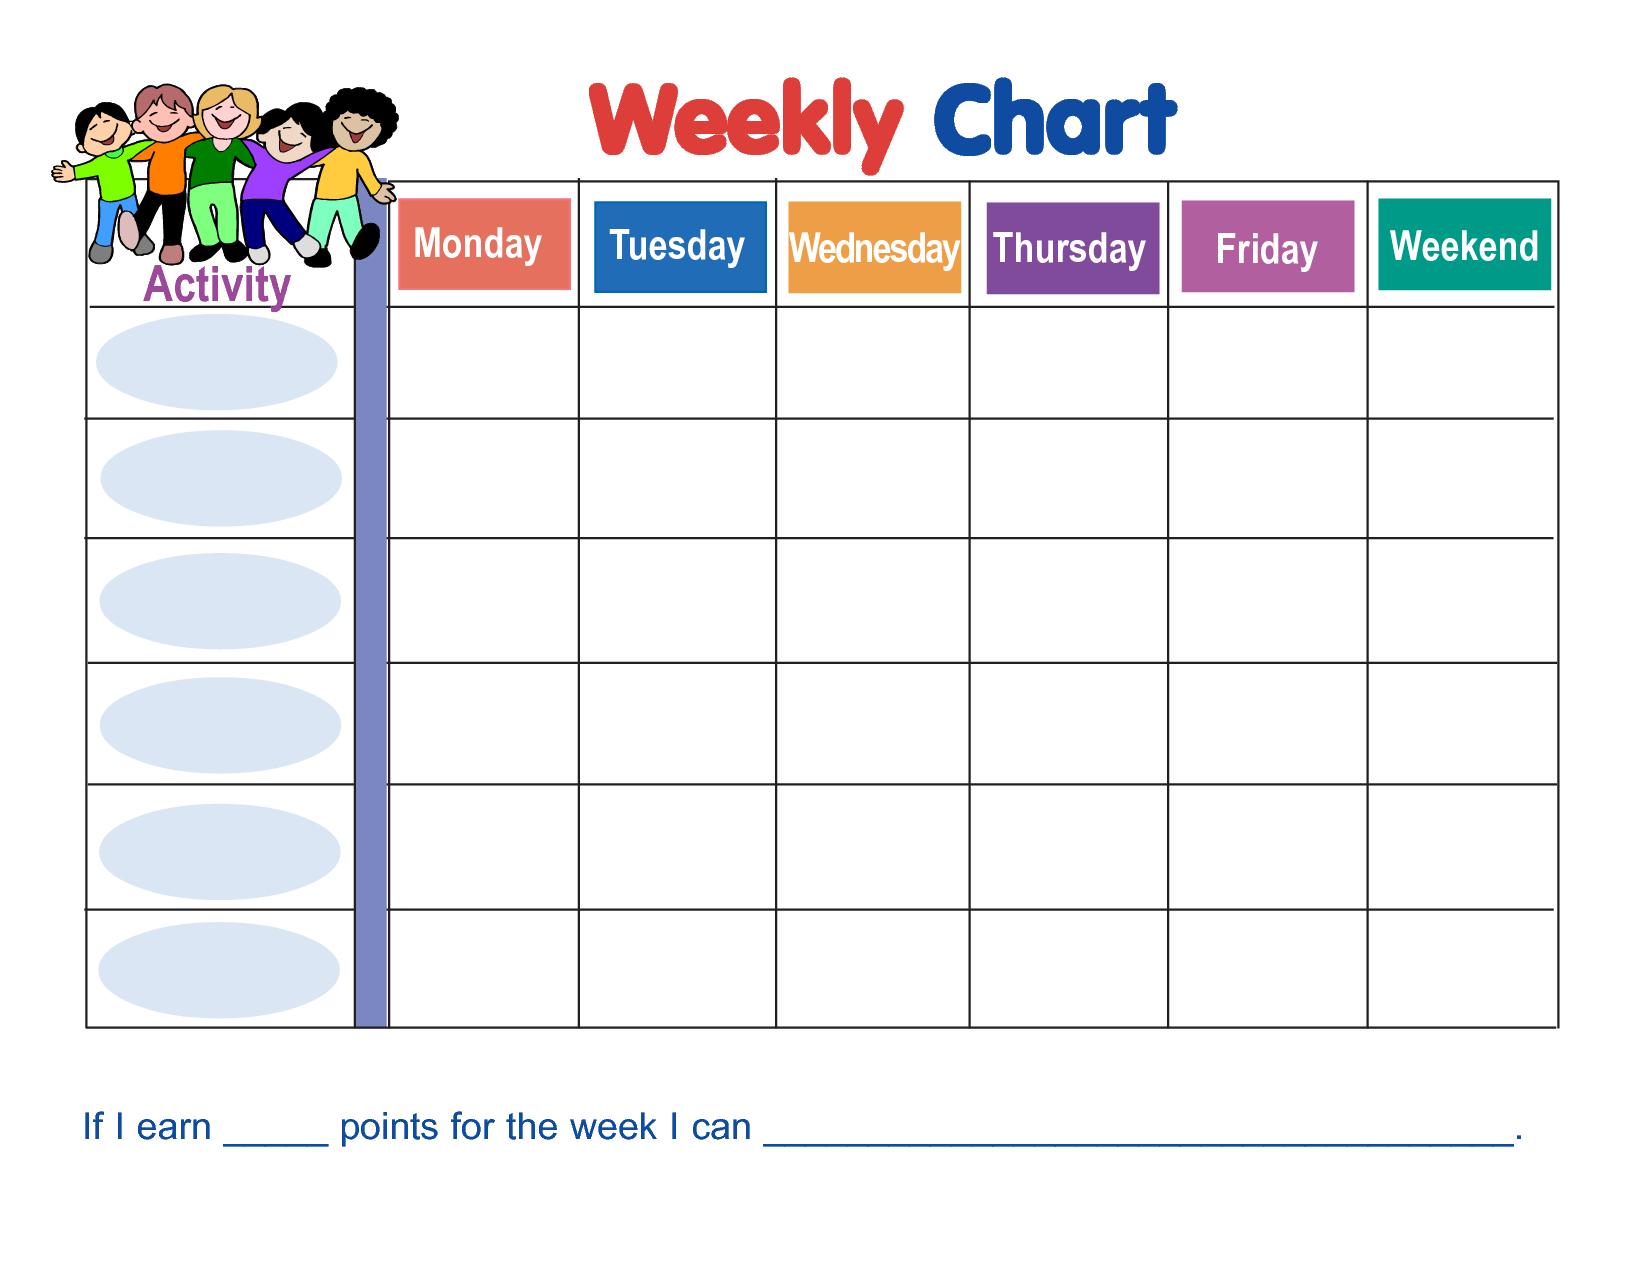 Weekly Behavior Chart Template | Wyatt | Weekly Behavior